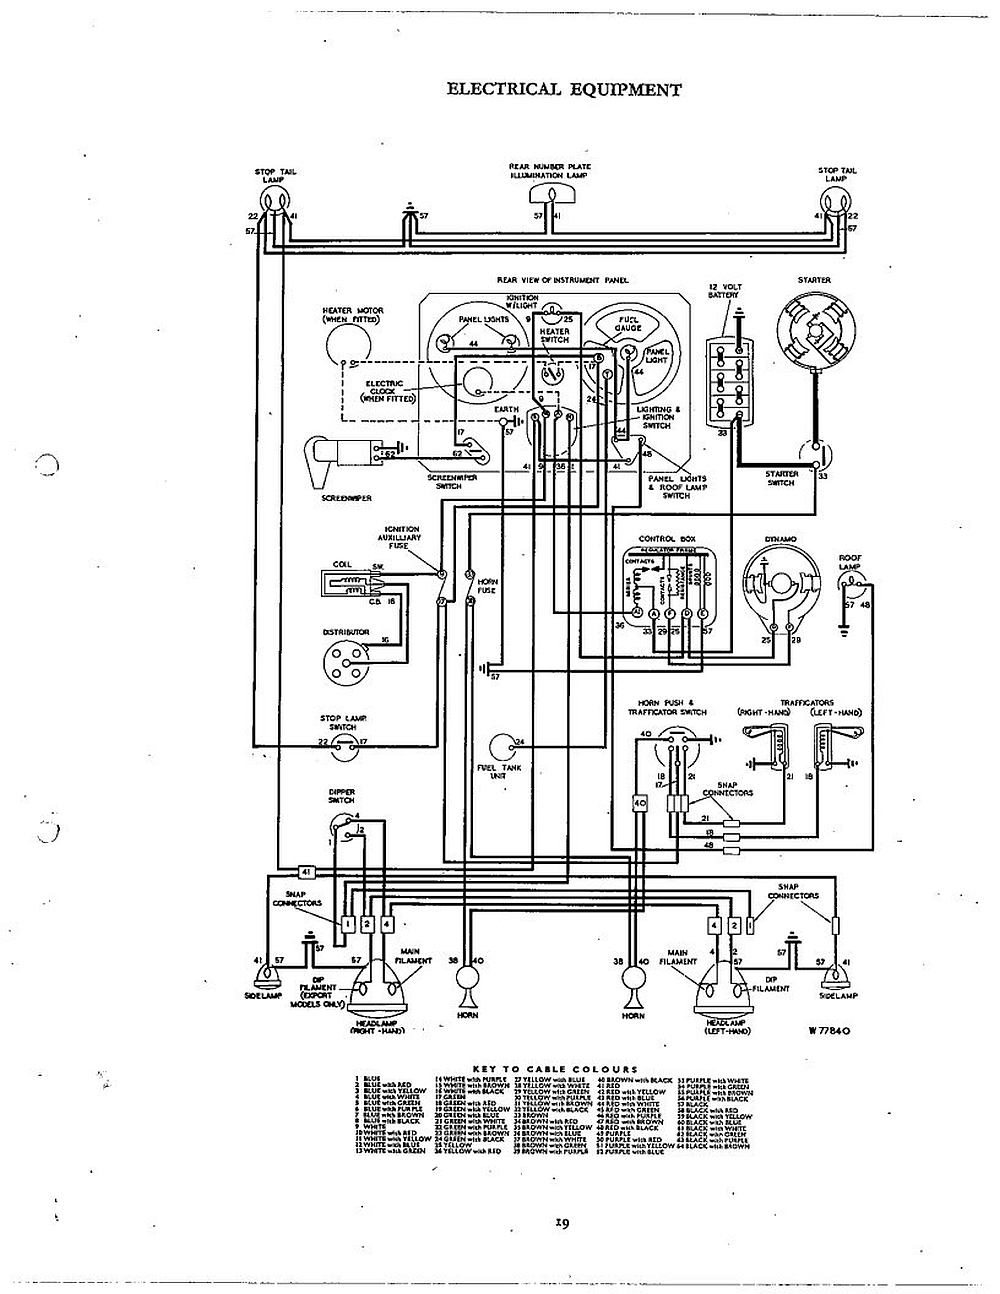 1974 tr6 wiring diagram wiring schematics diagram rh mychampagnedaze com